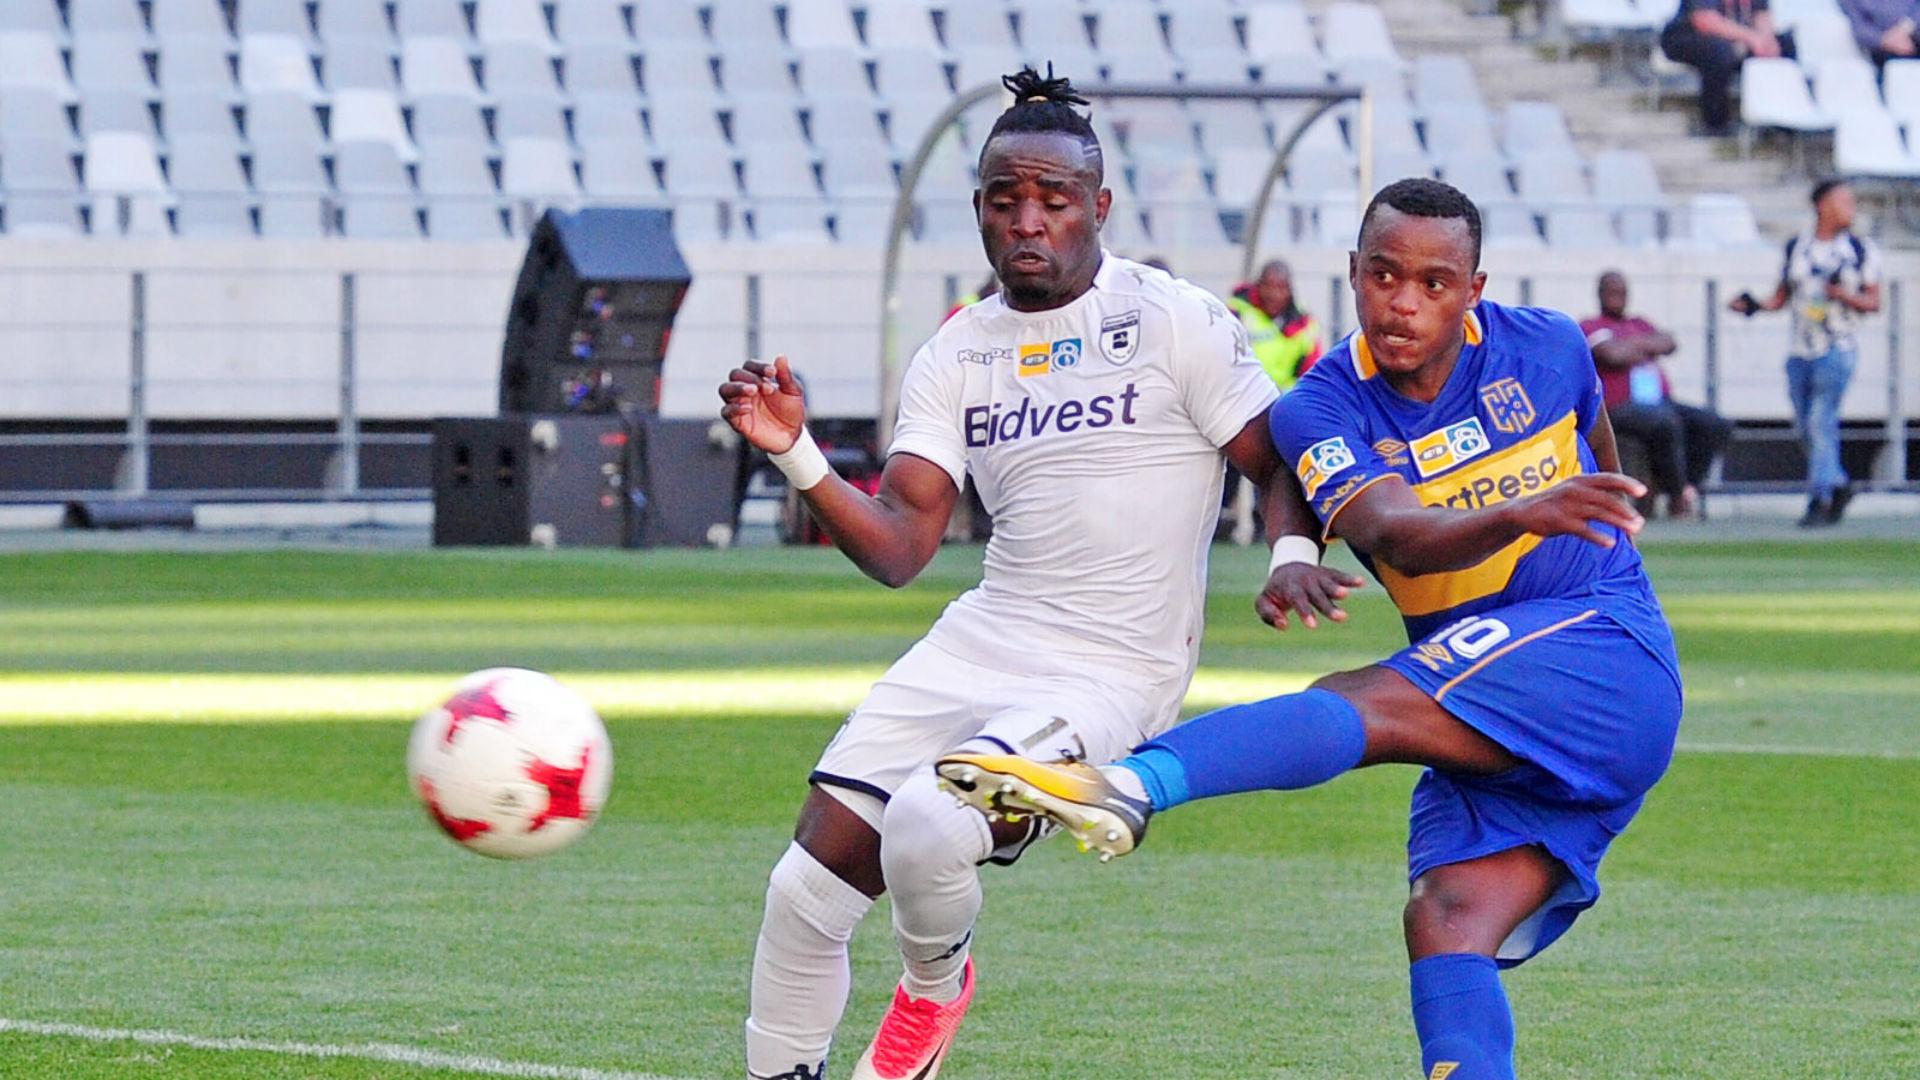 Ayanda Patosi of Cape Town City scores against Bidvest Wits